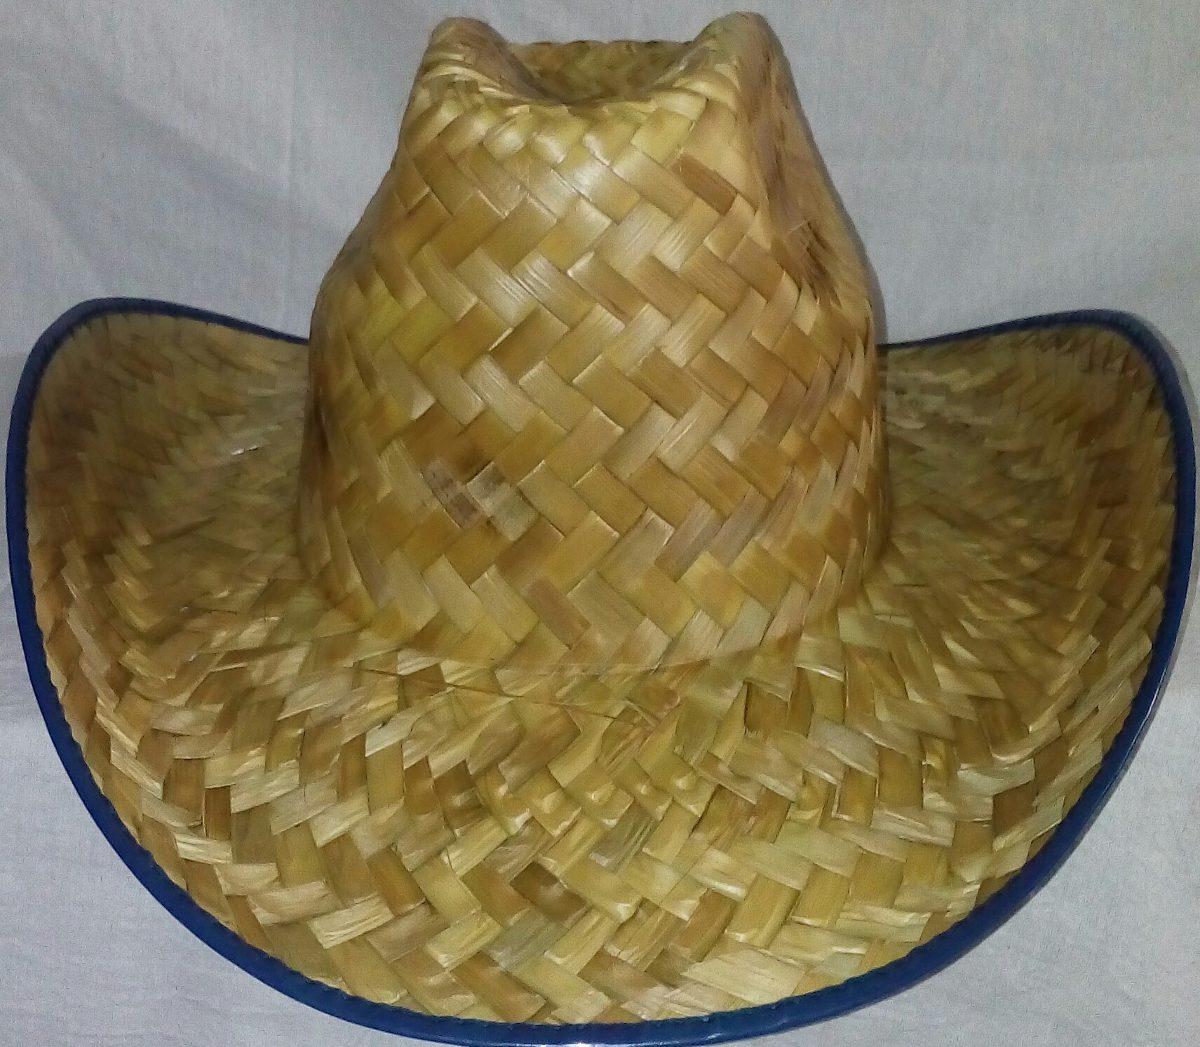 d98ba94700c03 60 Sombrero De Palma